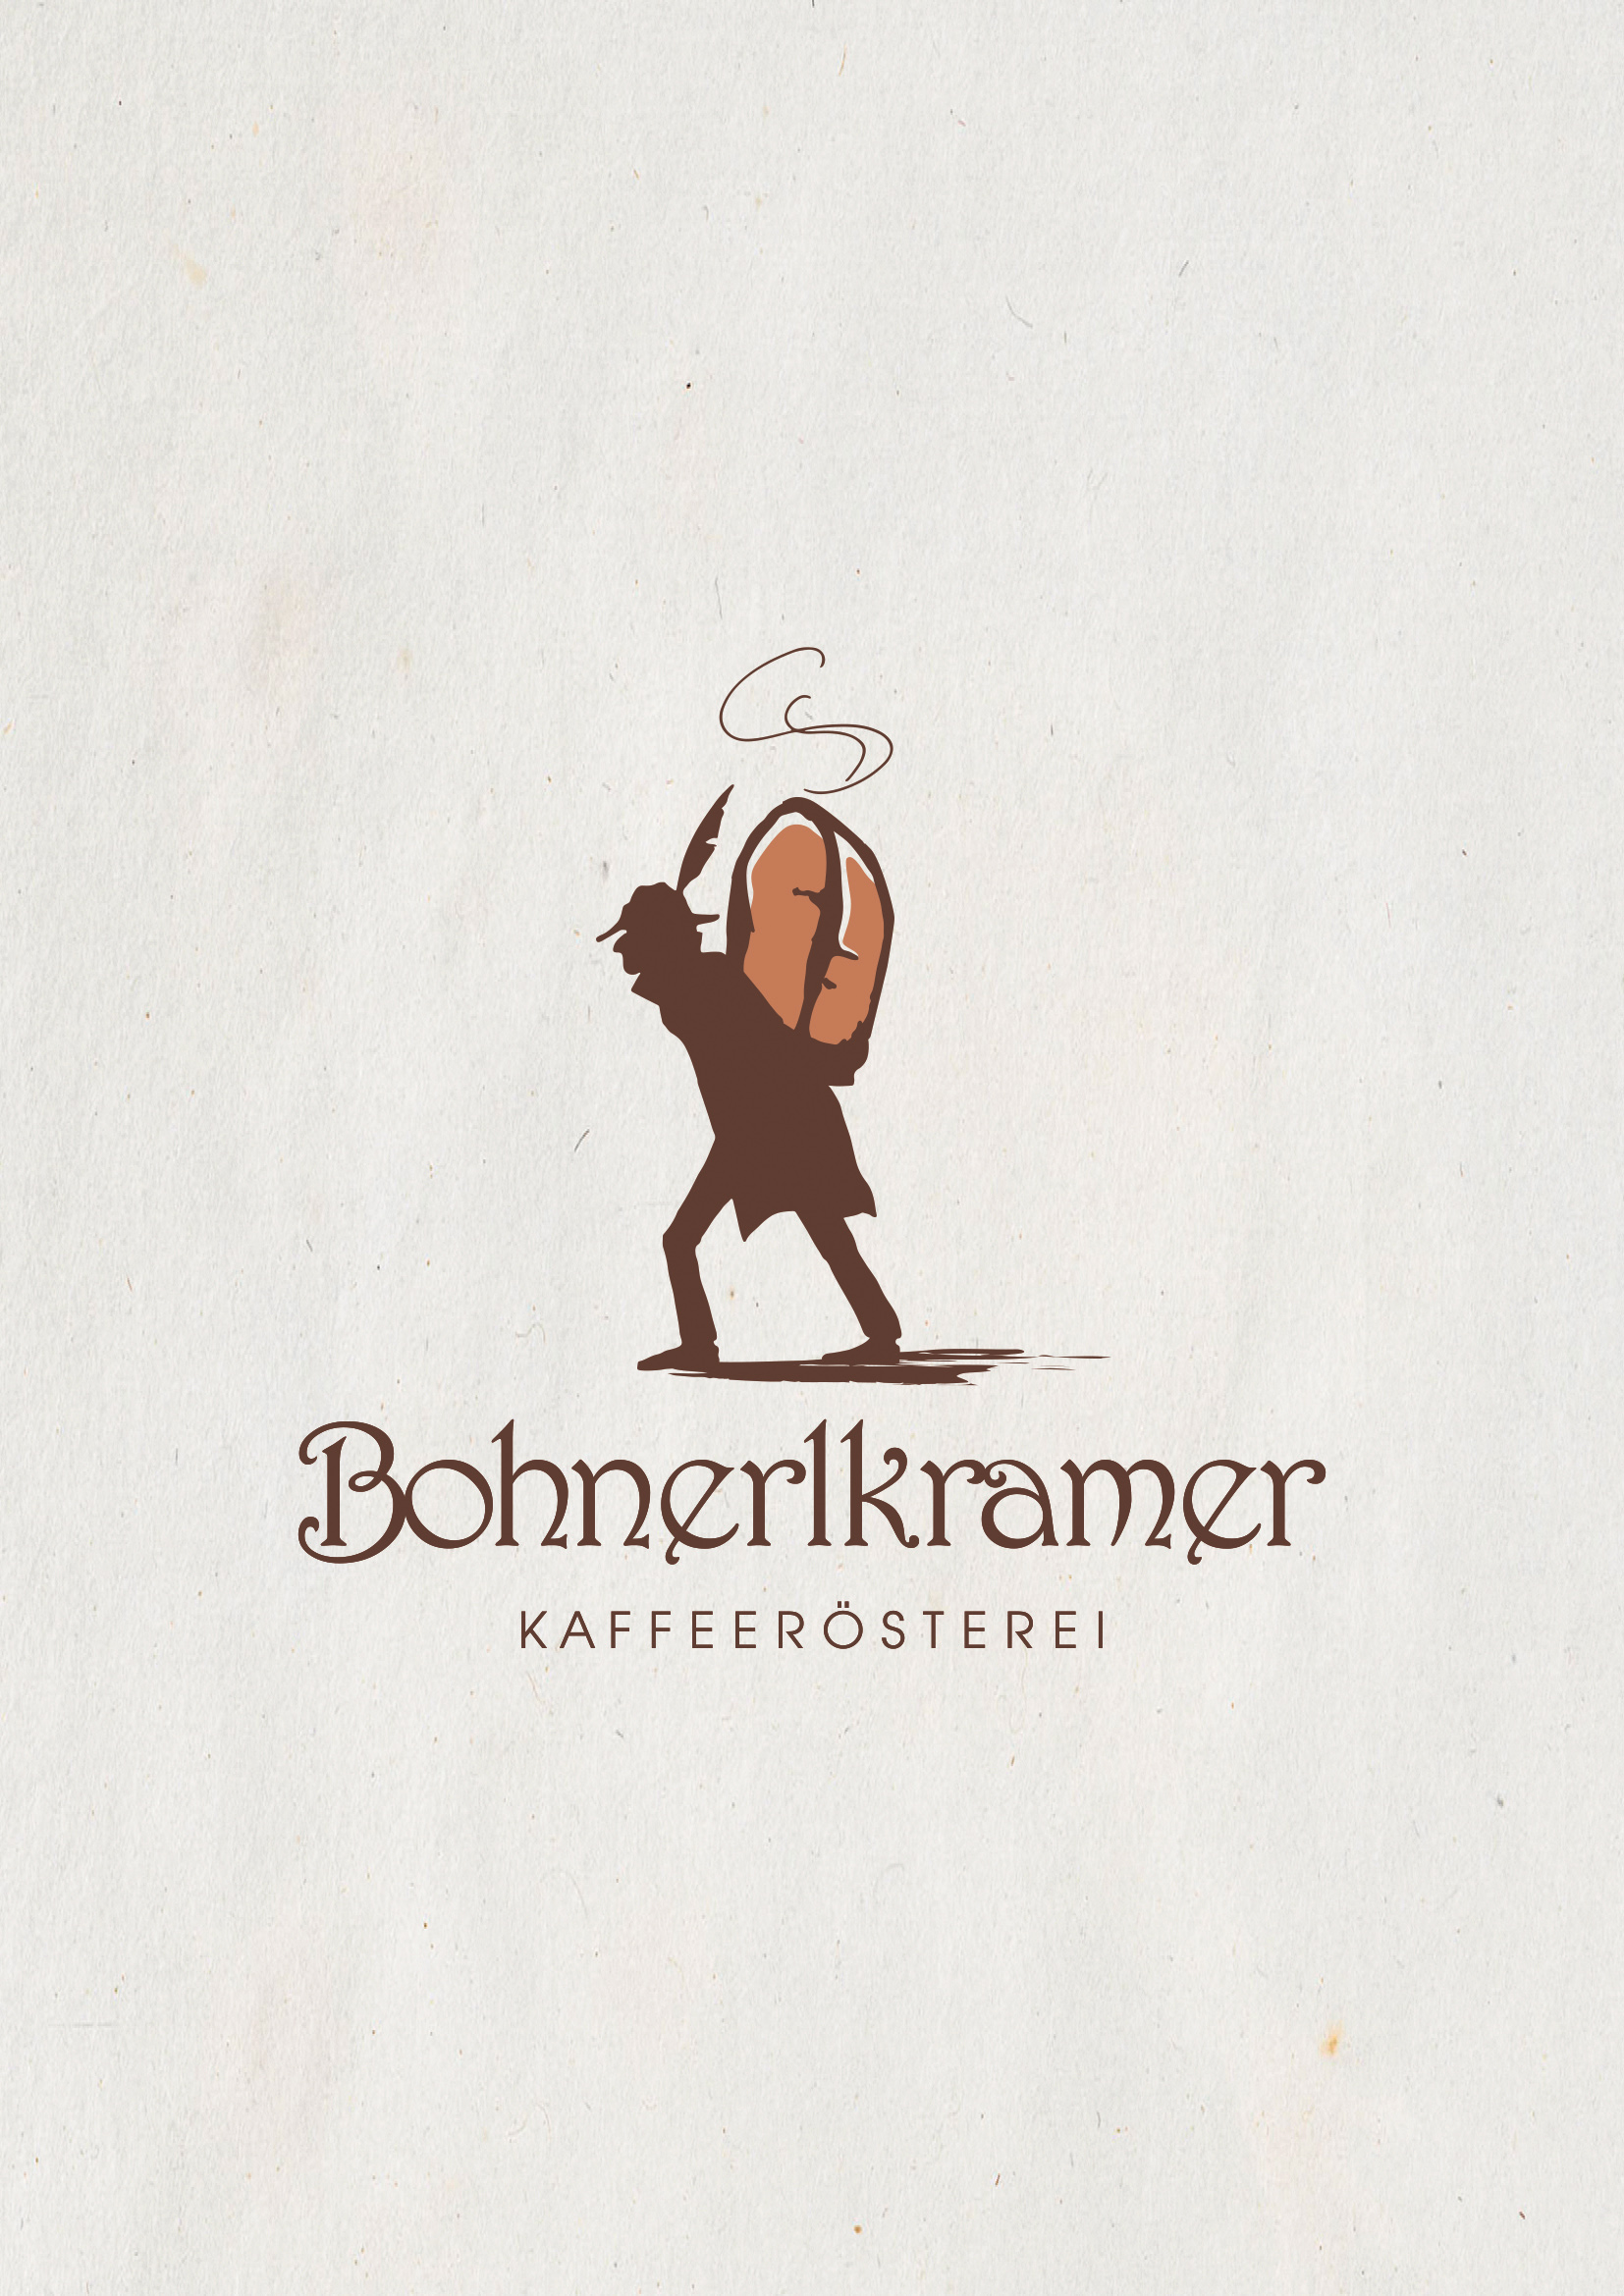 Kaffeerösterei sucht Logo